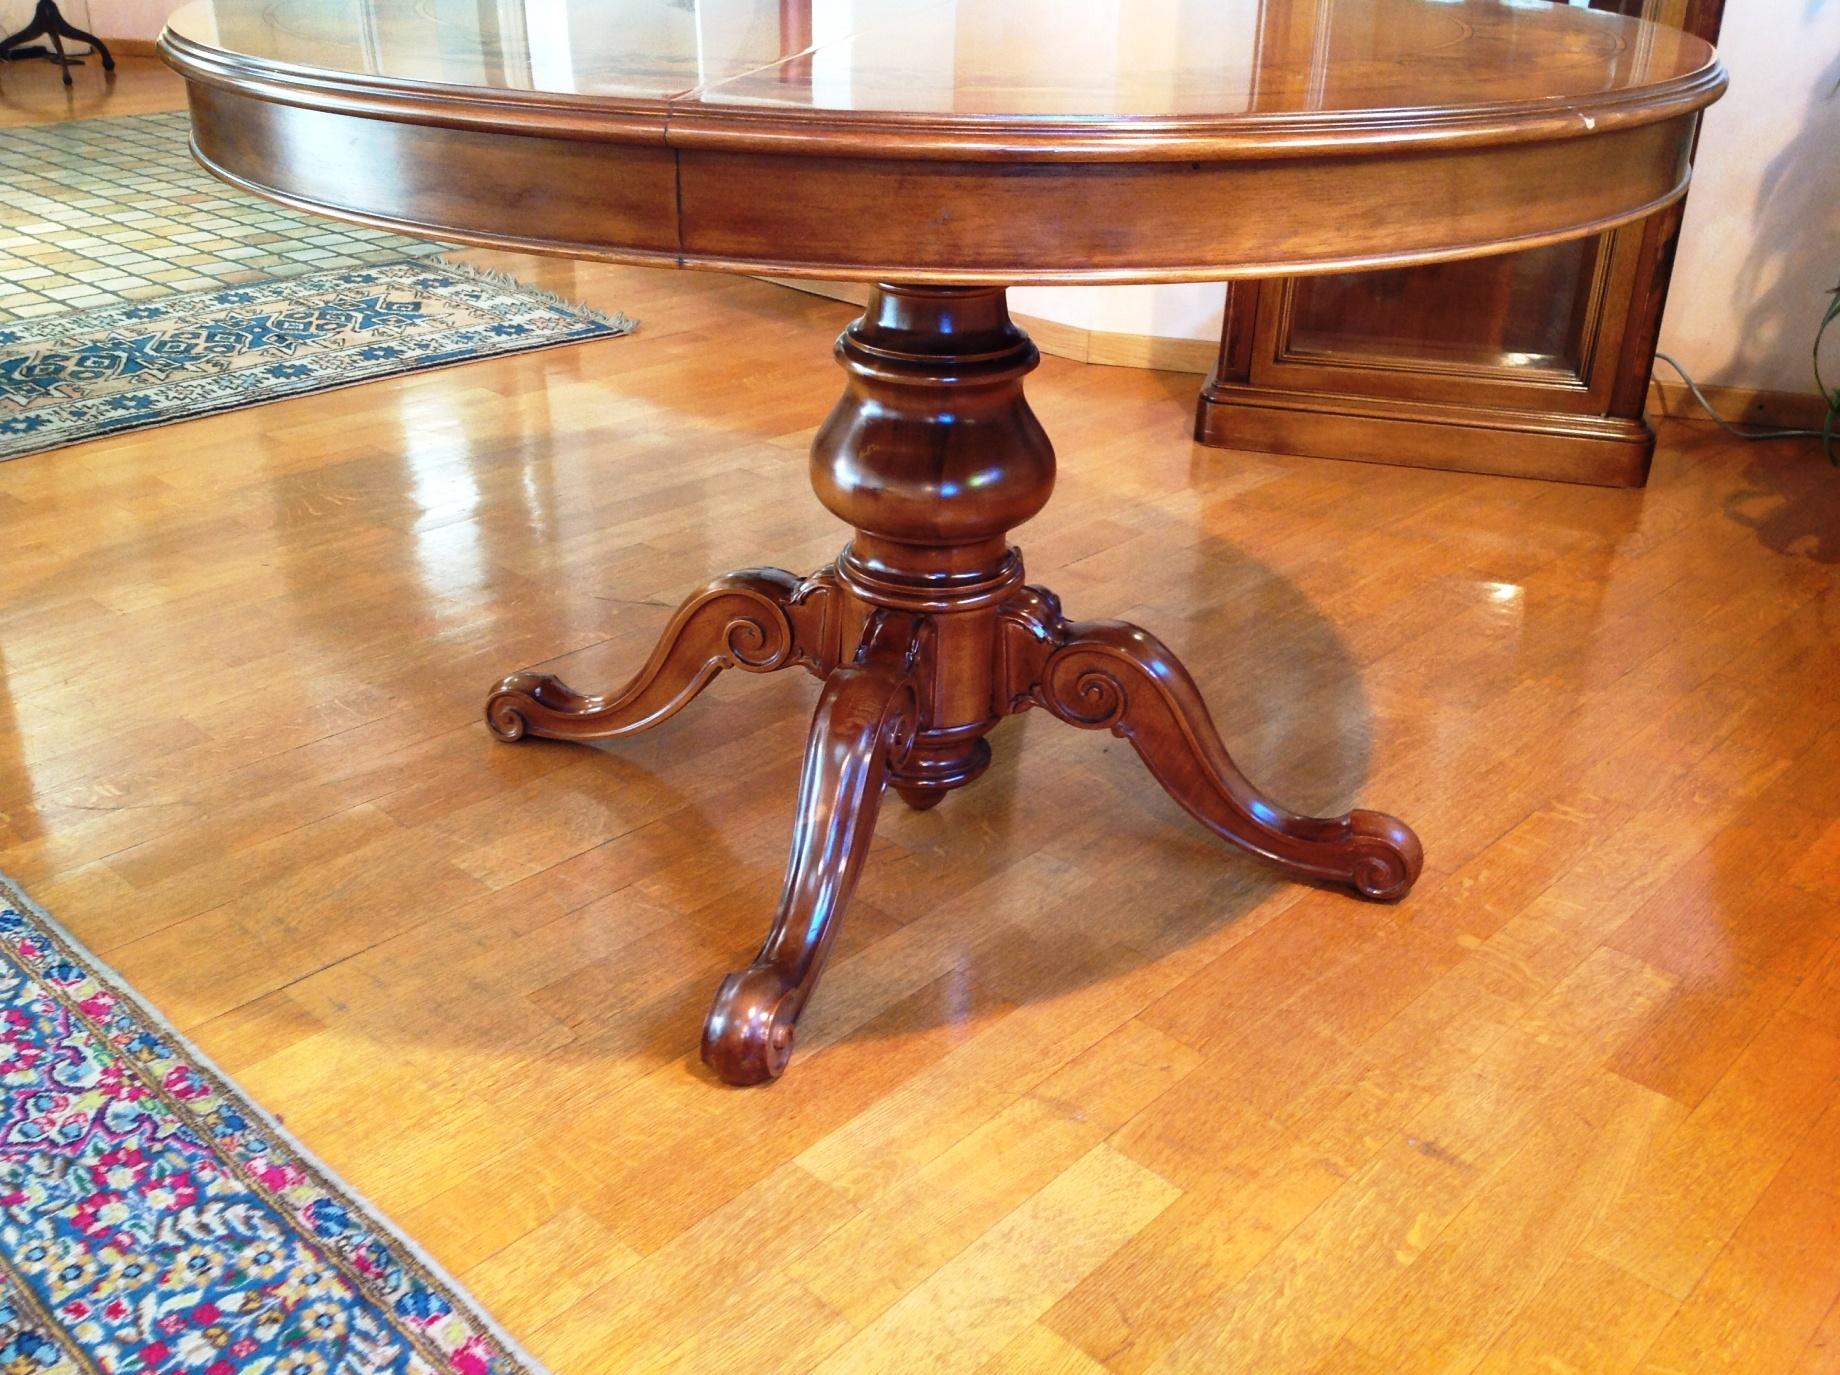 Tavolo artigianale diametro 120 allungabile in legno stile - Tavolo consolle allungabile stile classico ...